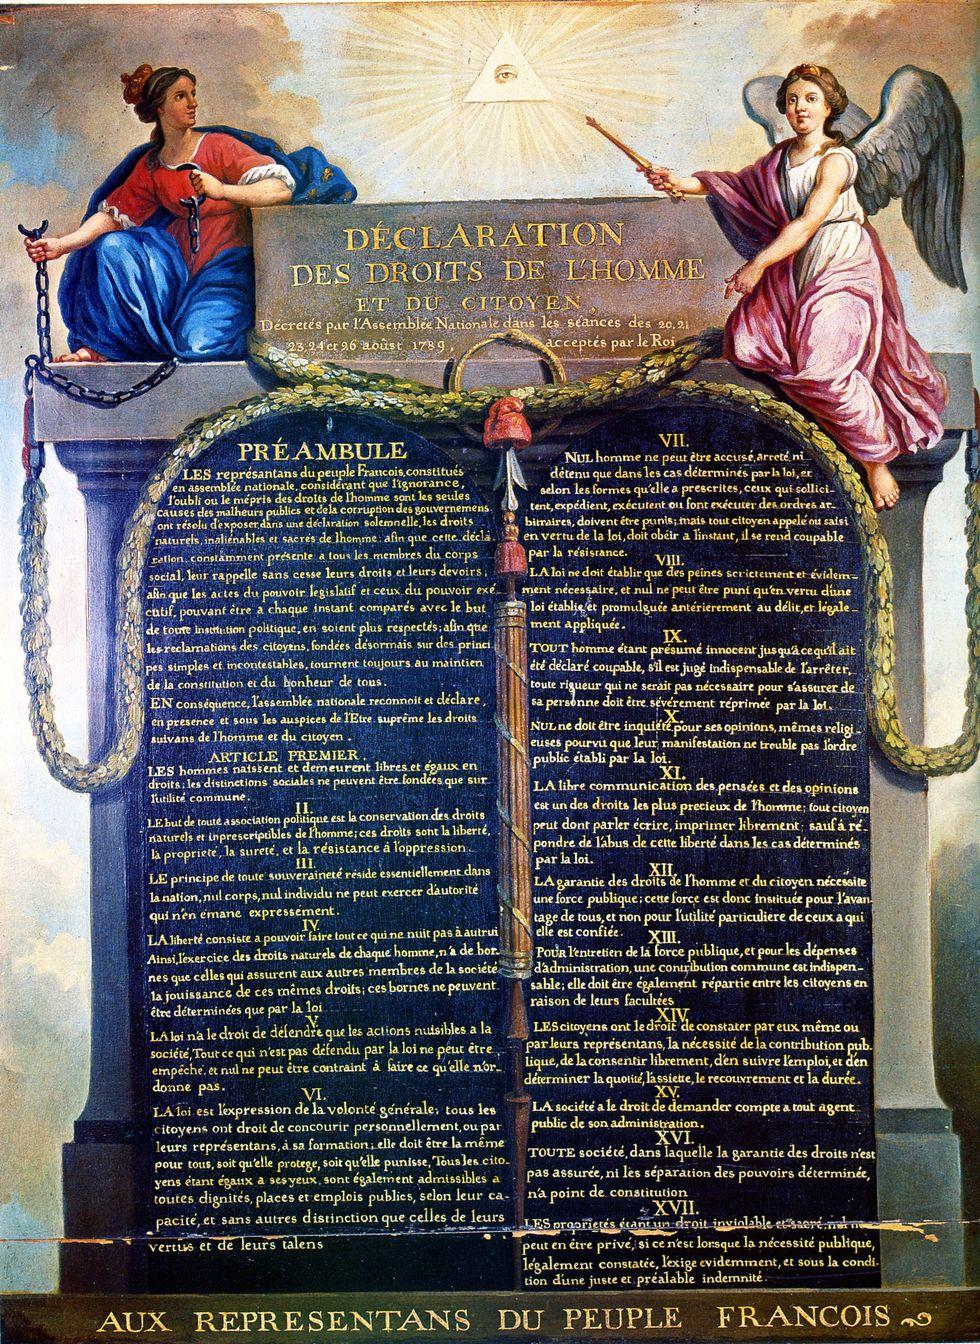 Appreciation for the Declaration Des Droits